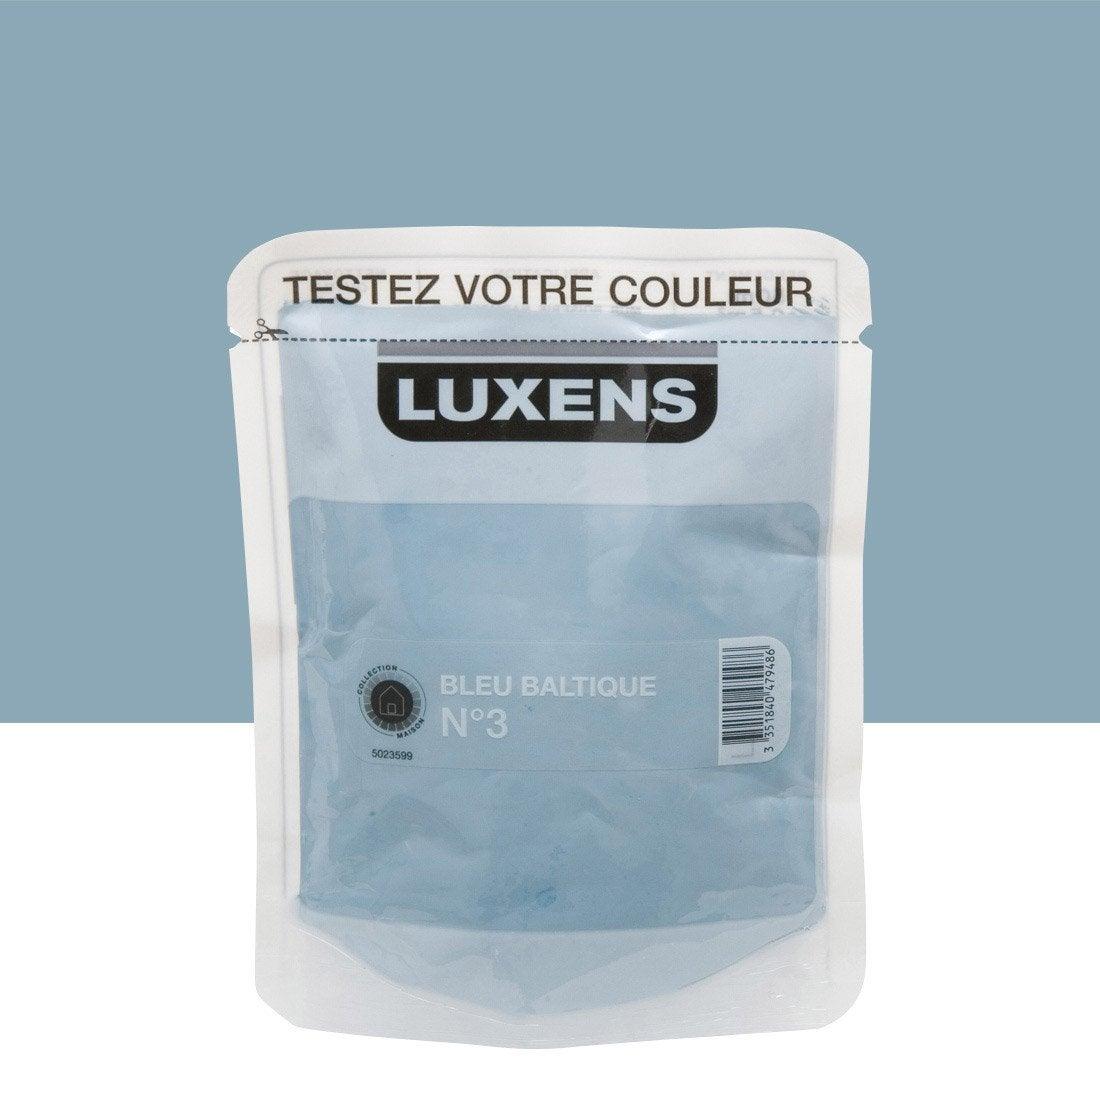 Testeur peinture bleu baltique 3 luxens couleurs for Peinture bleu marine leroy merlin